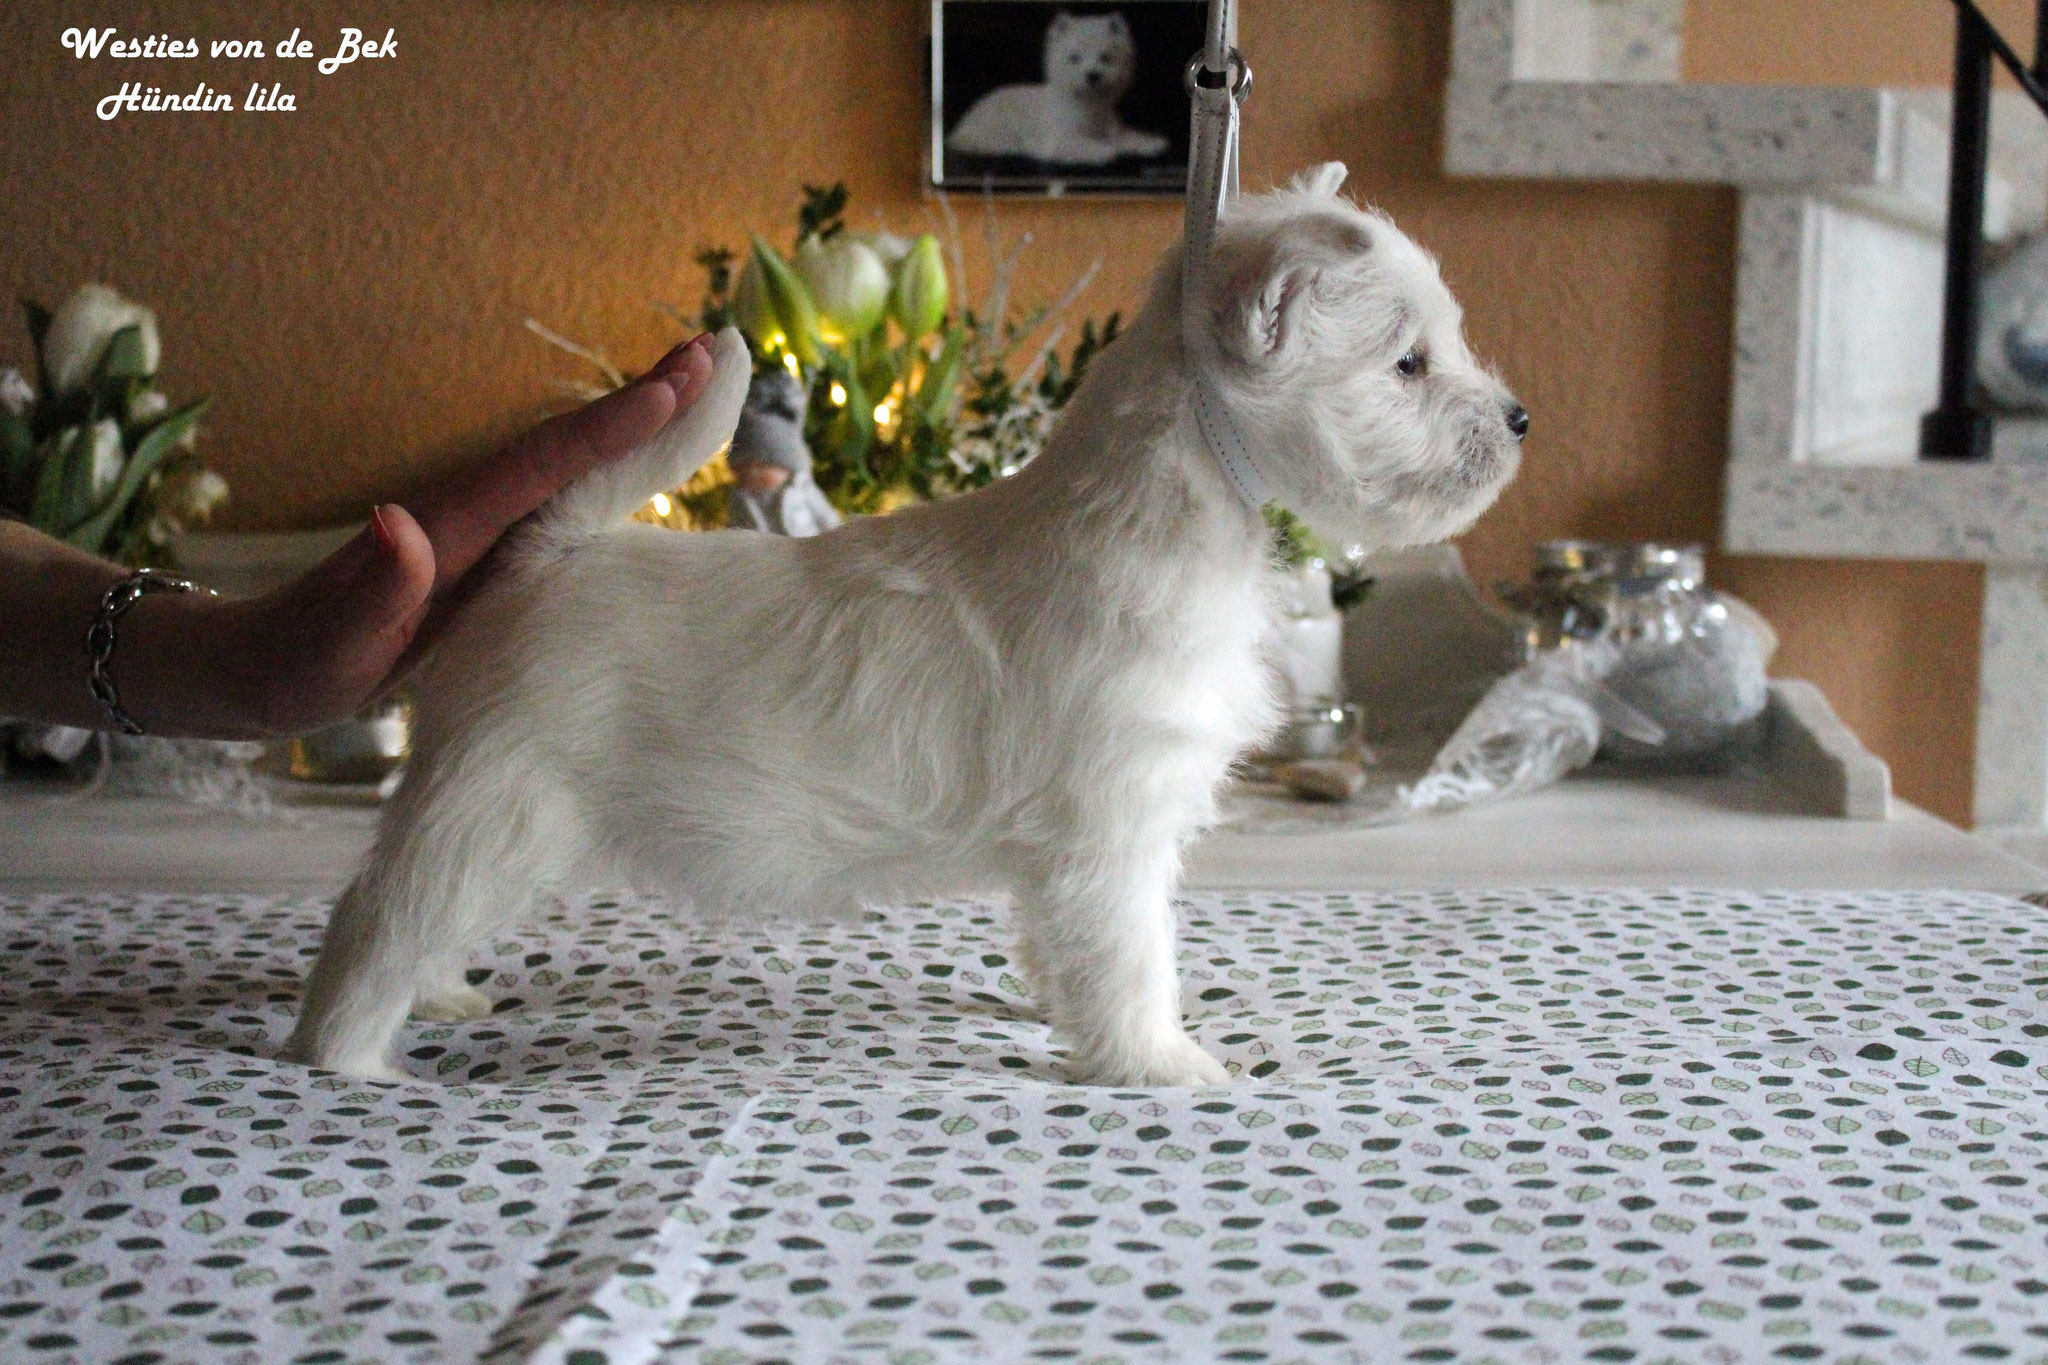 Hündin lila 7 Wochen alt